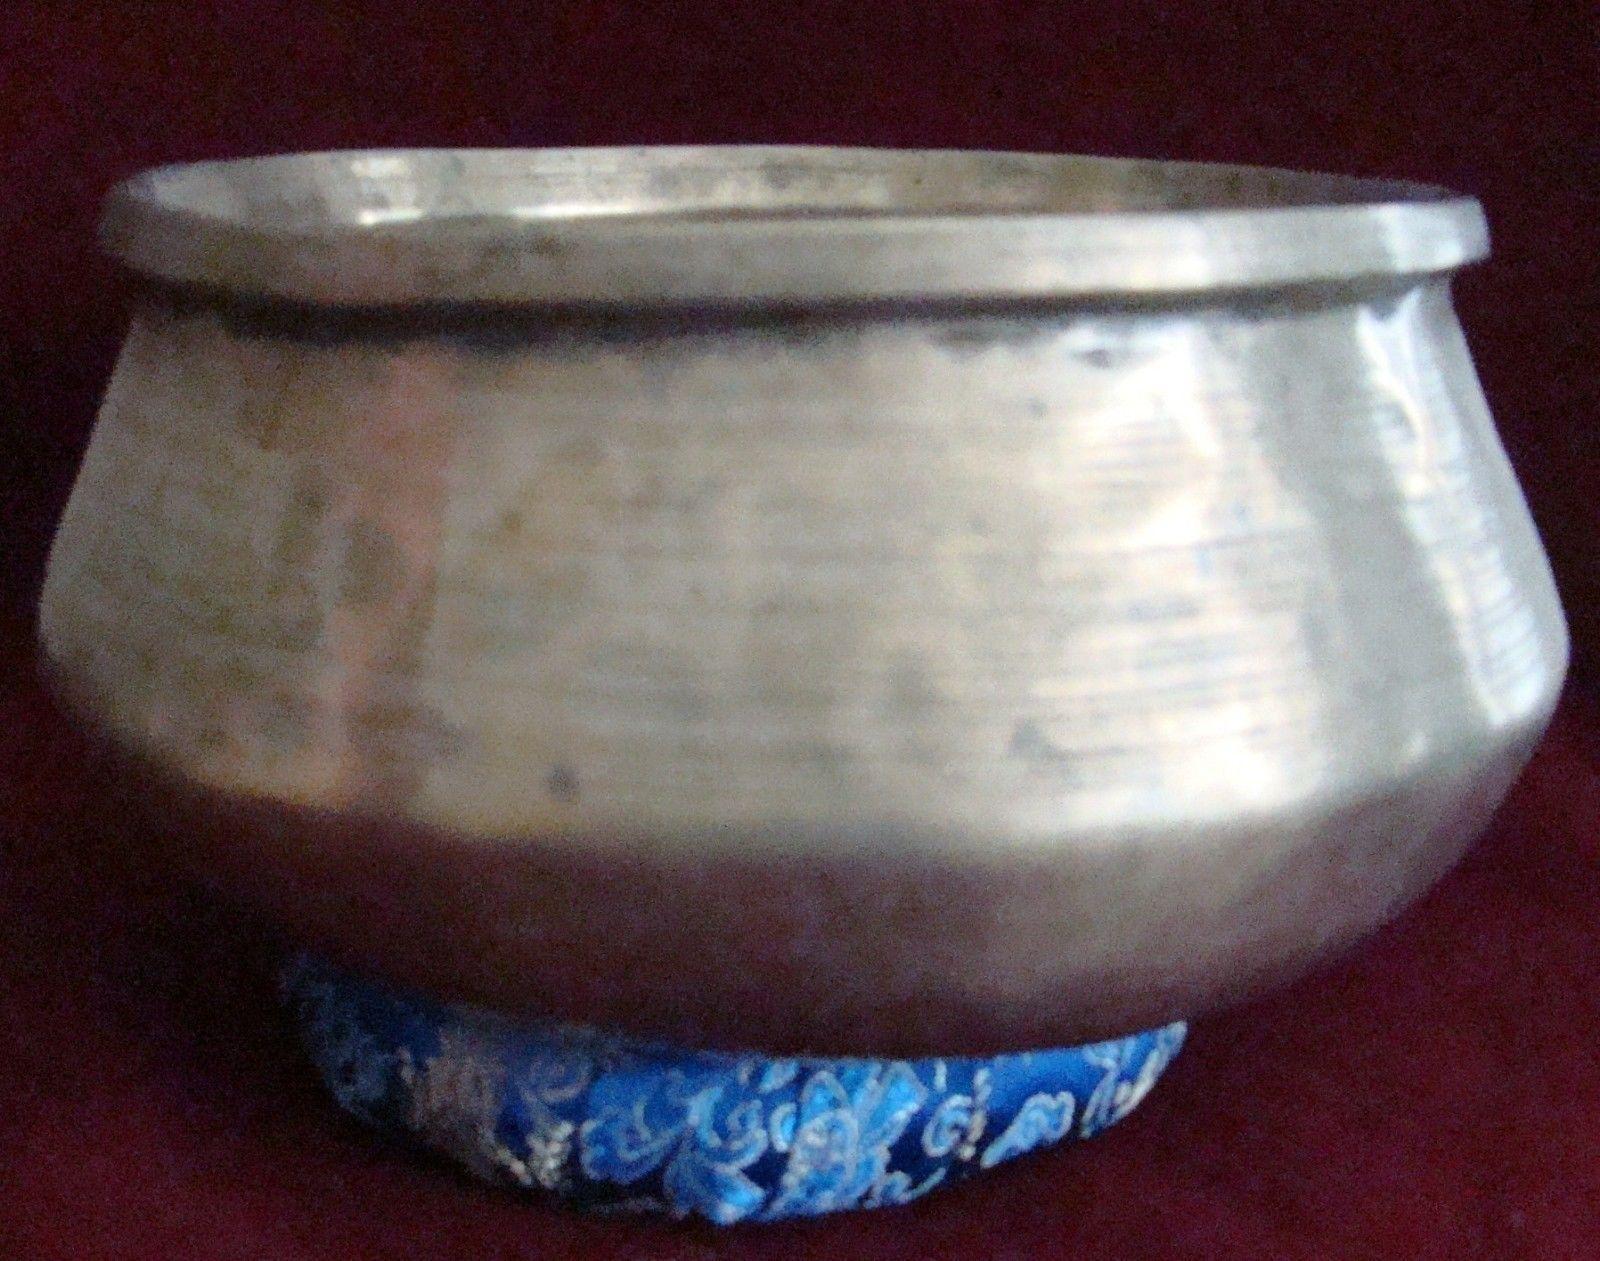 Alte Seltene Hundi klangschale( Singing Bowl Old and Rare Hundi Bowl)